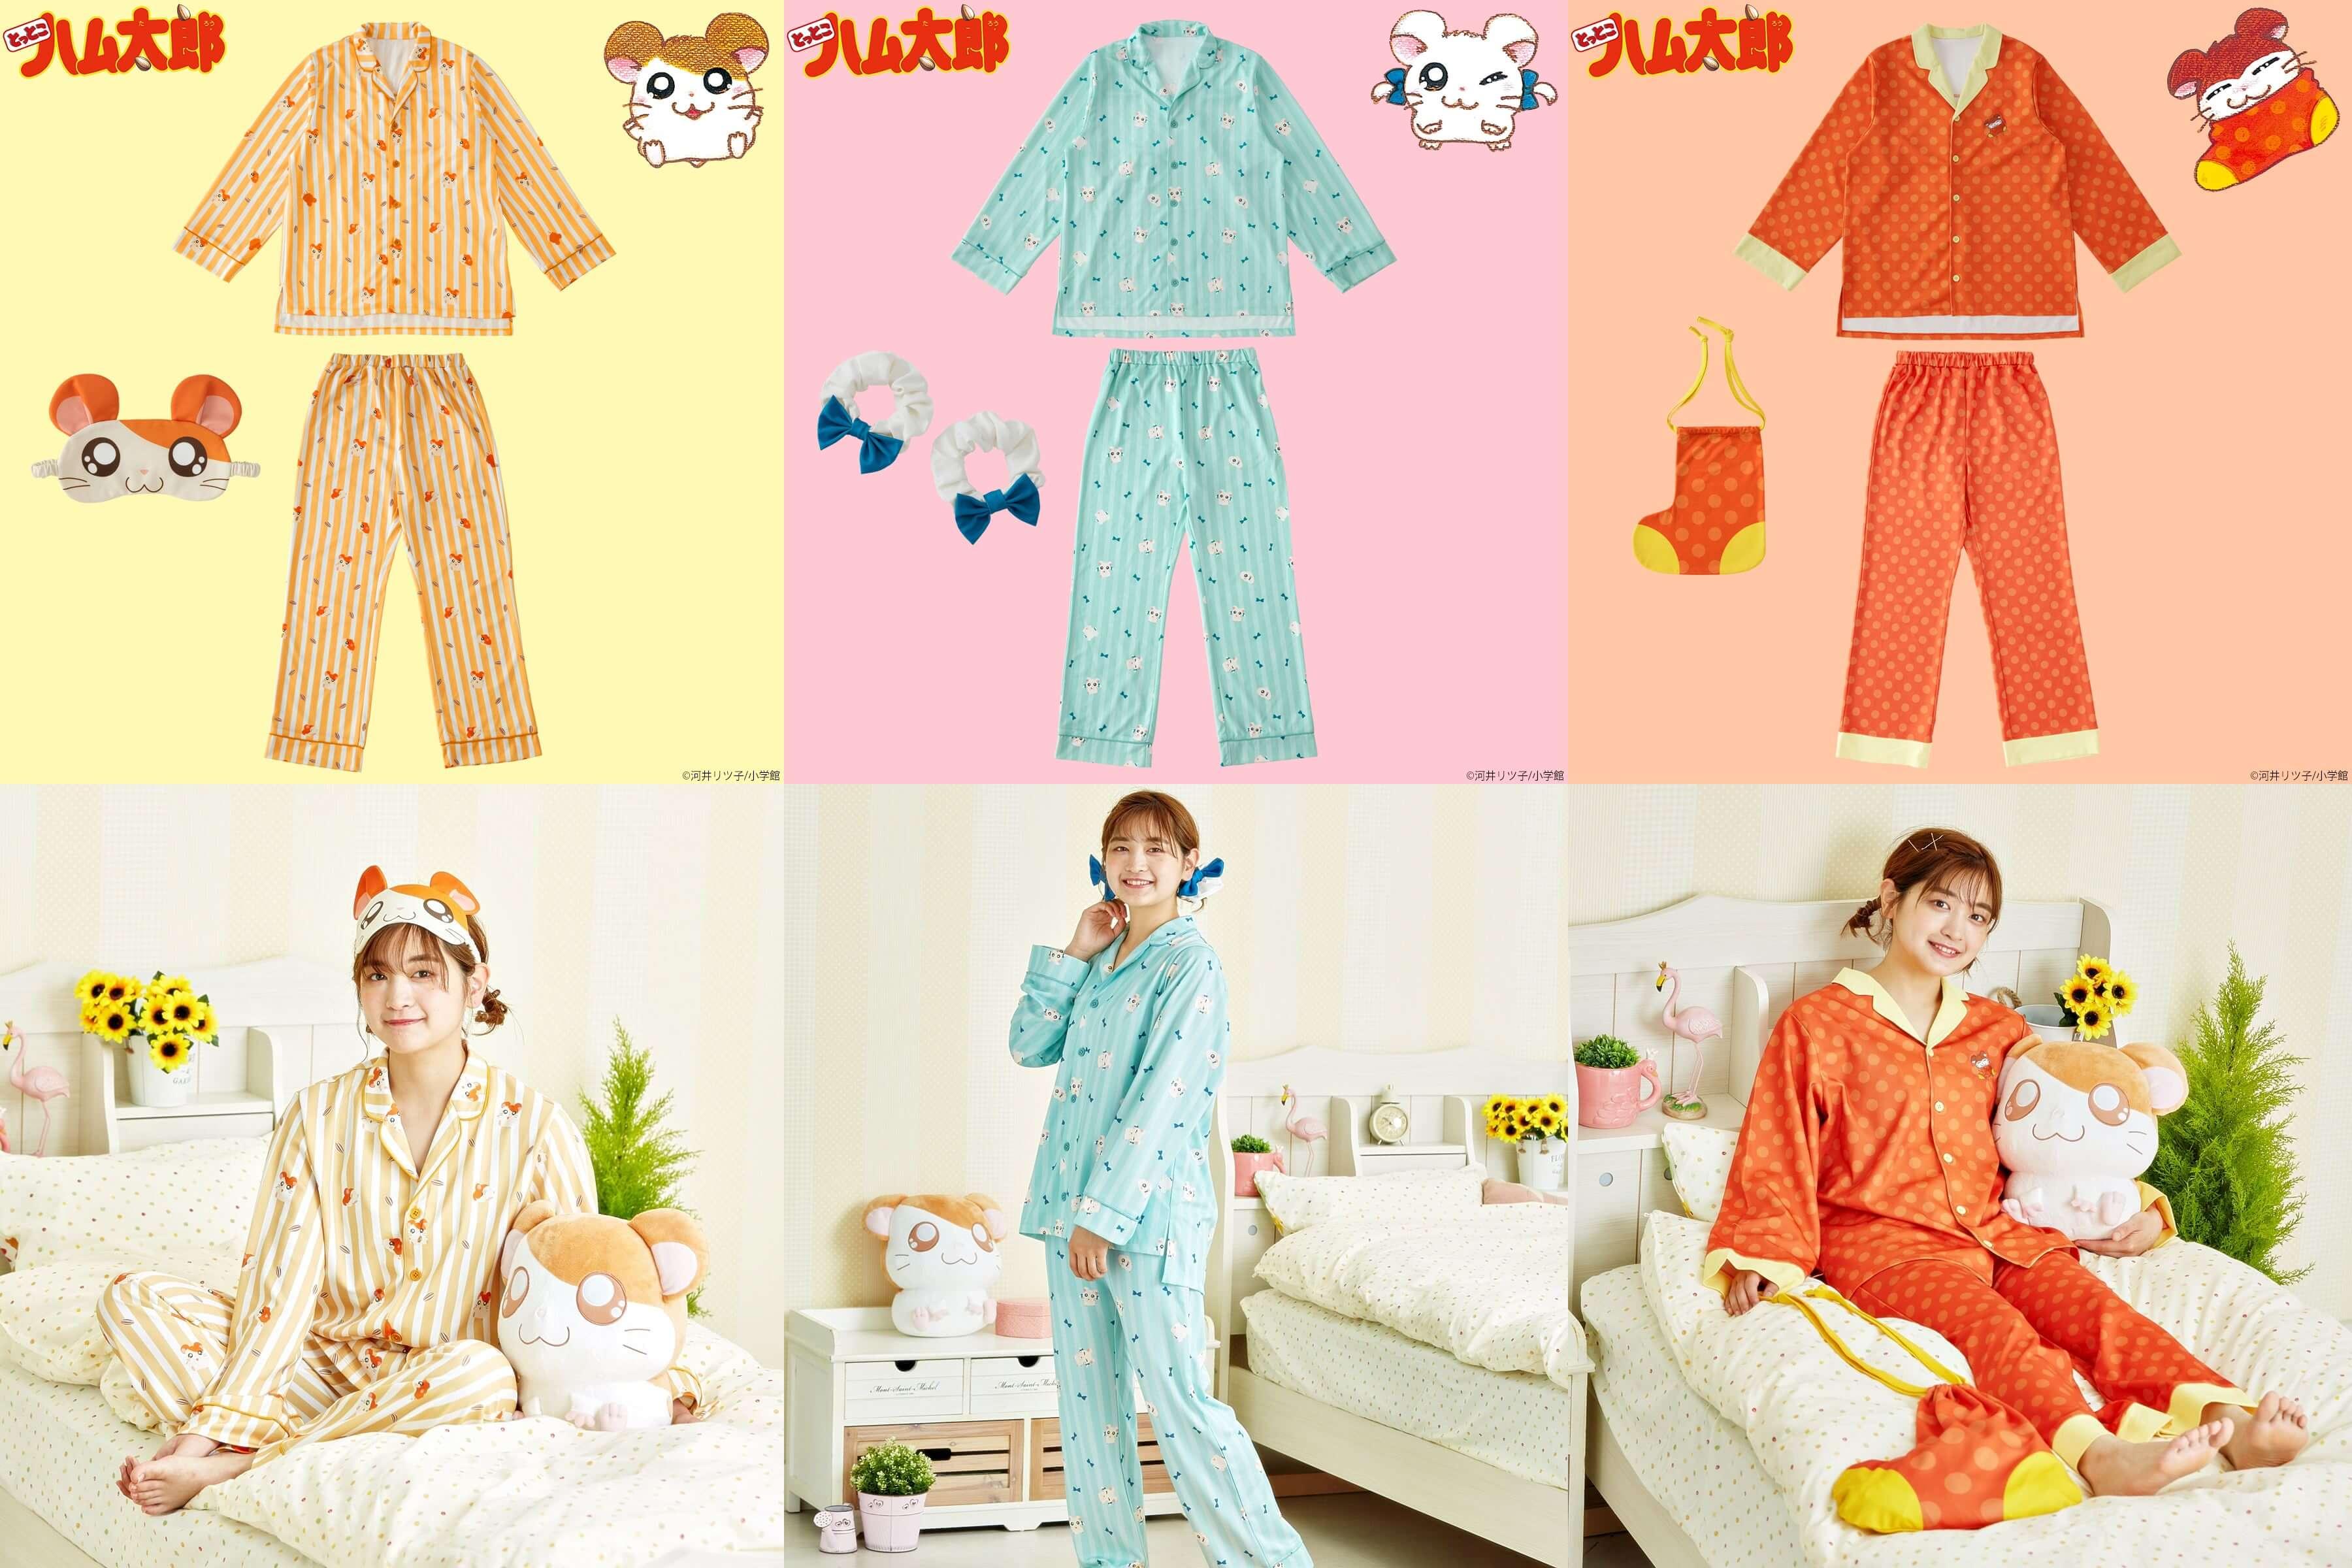 main とっとこハム太郎 tottoko hamu taro パジャマ ワンピース pajama one piece img_185934_1